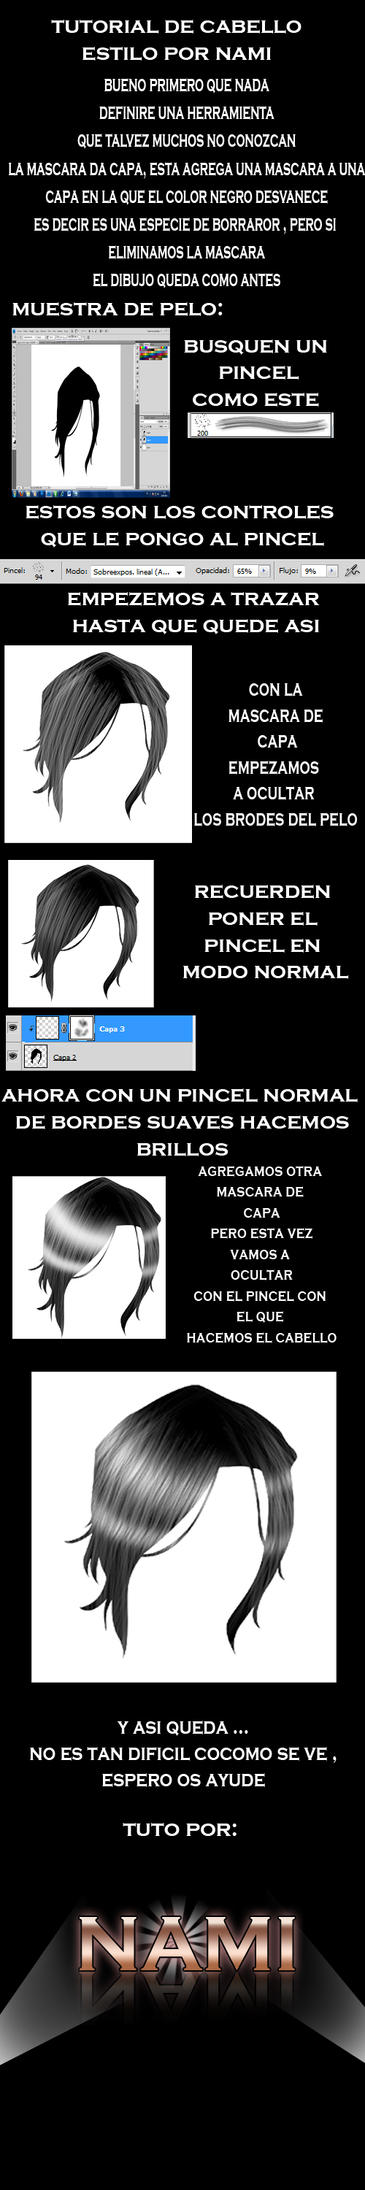 tutorial de cabello by miguelnamikaze005